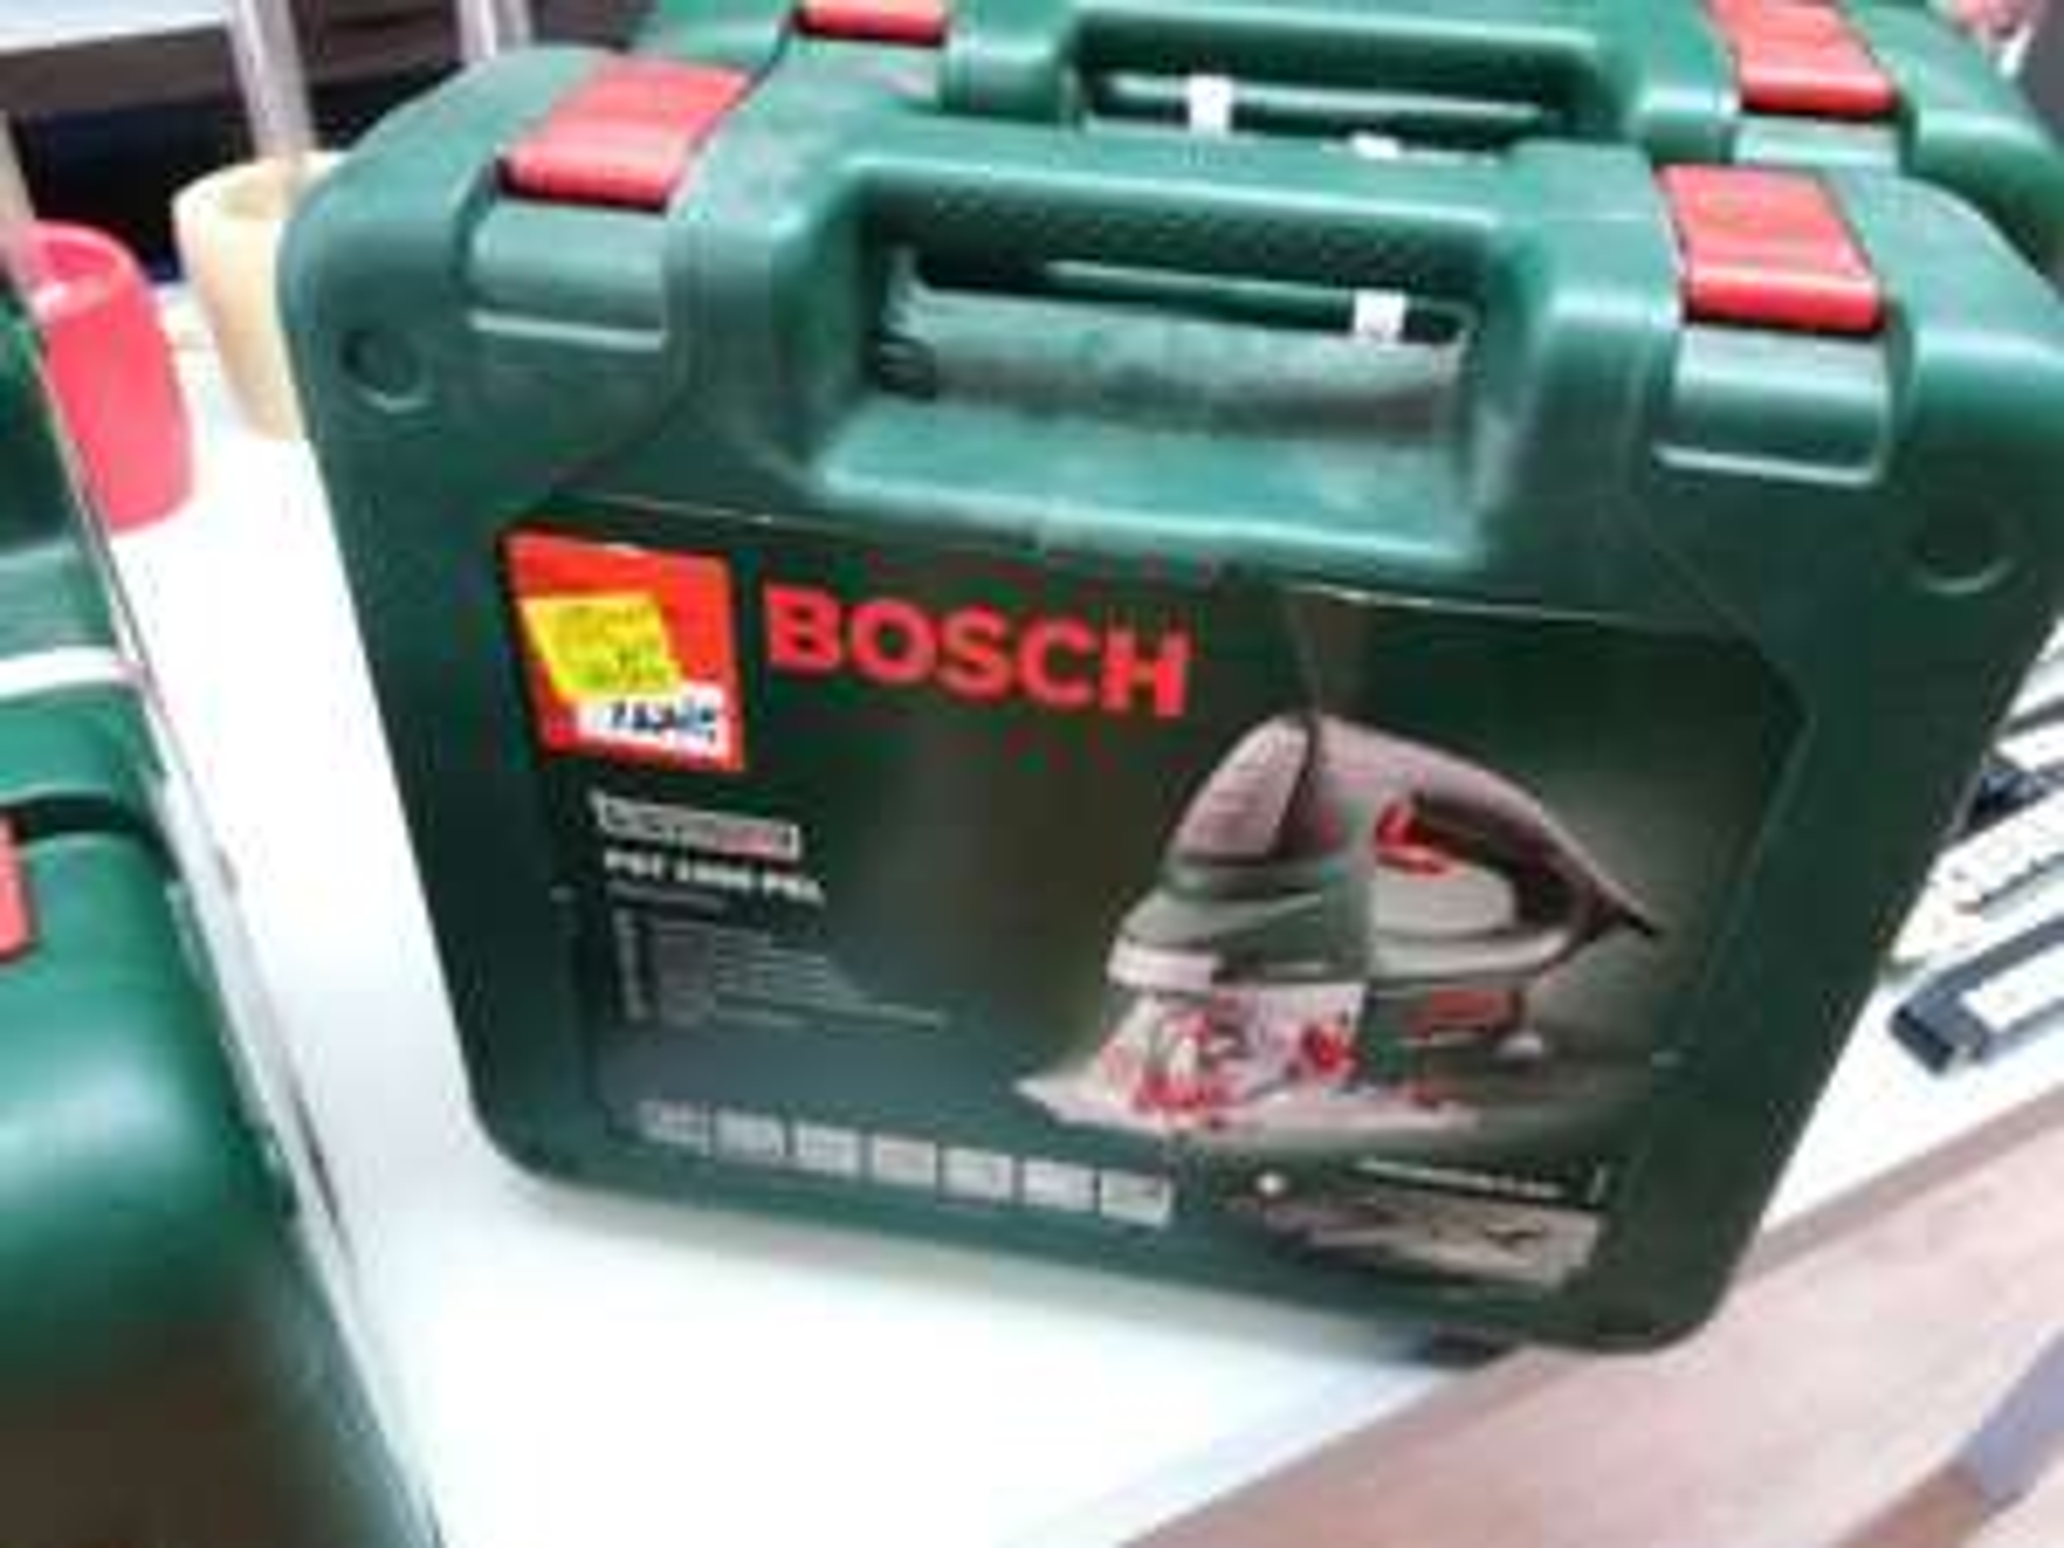 (Lokal) Bosch PST 1000 PEL im Bauhaus Heidelberg Innenstadt